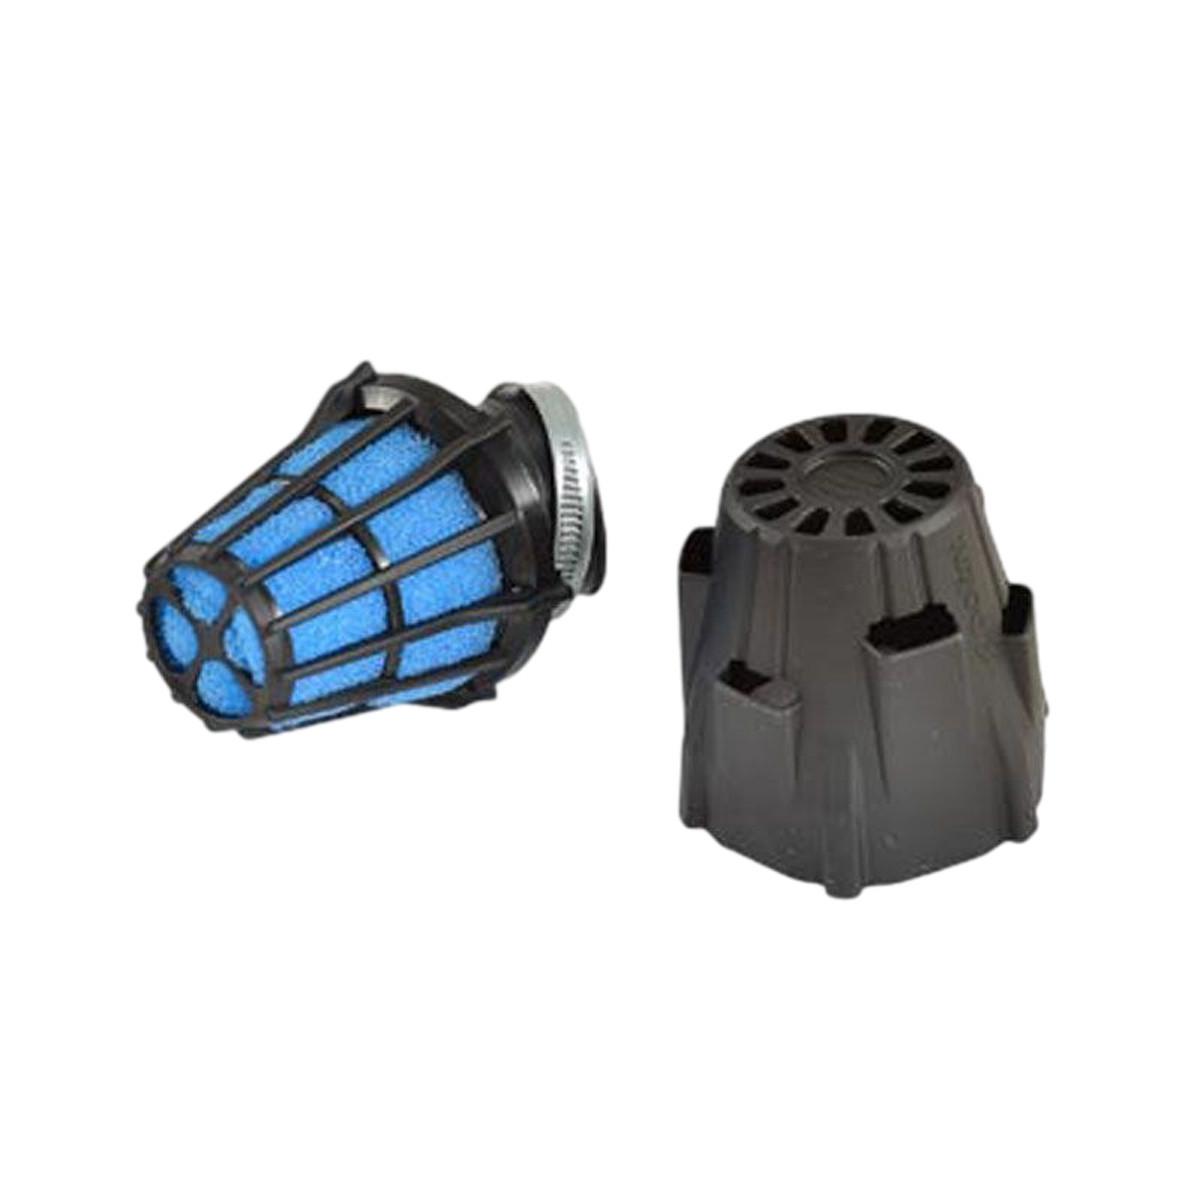 Filtre à Air + Boite Coudé 30° Ø37mm PHBG - POLINI